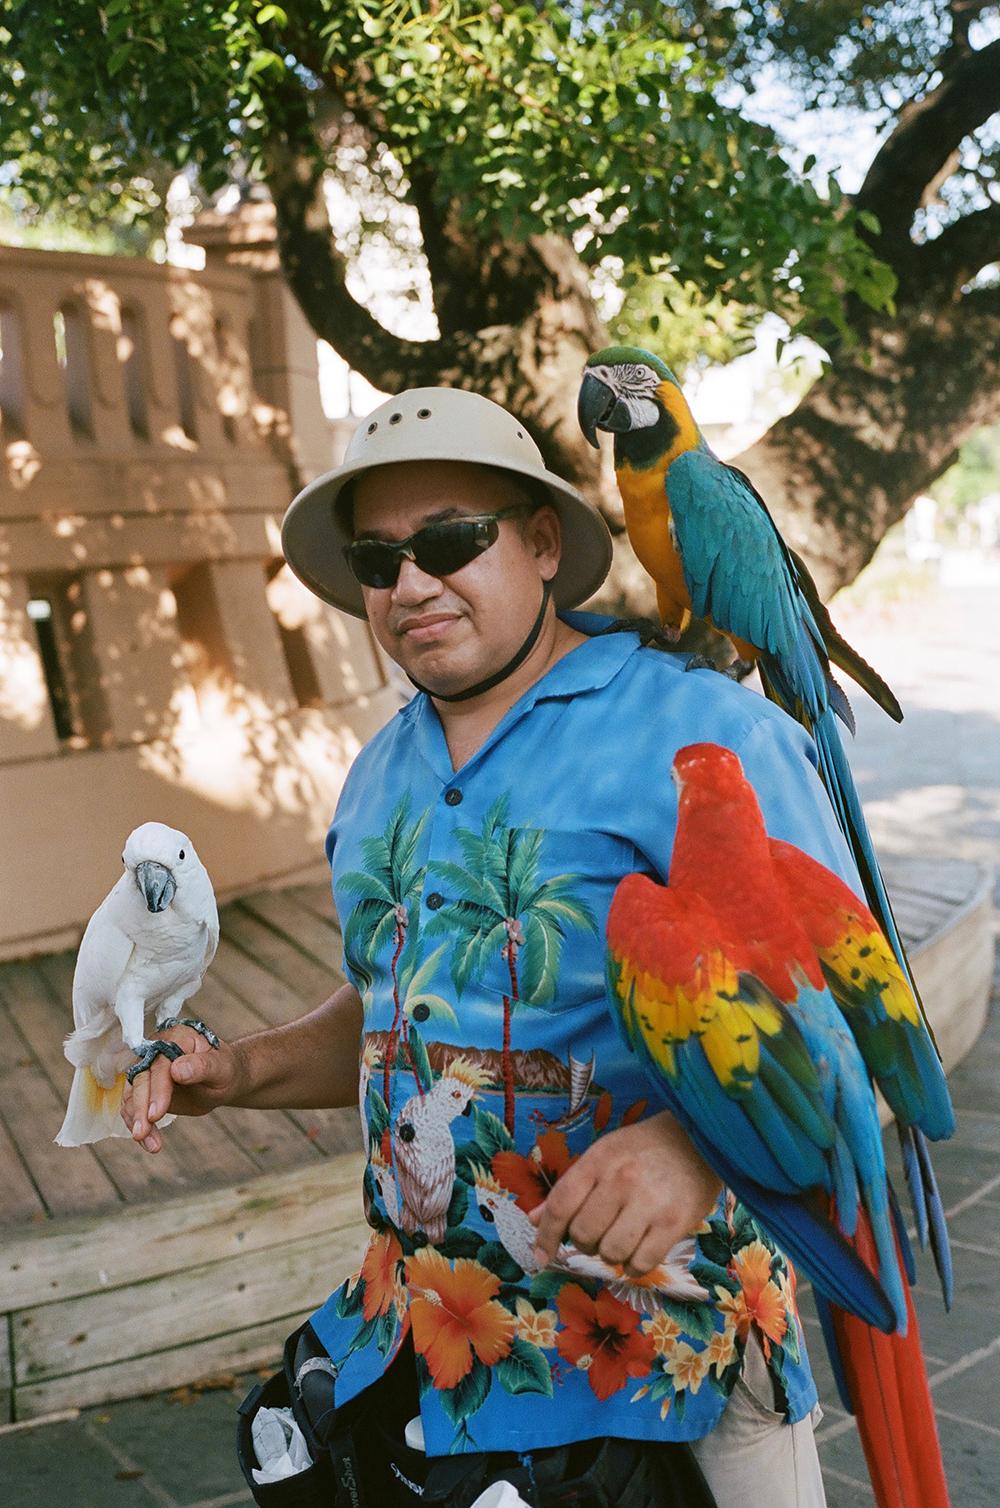 parrotguyprweb.jpg